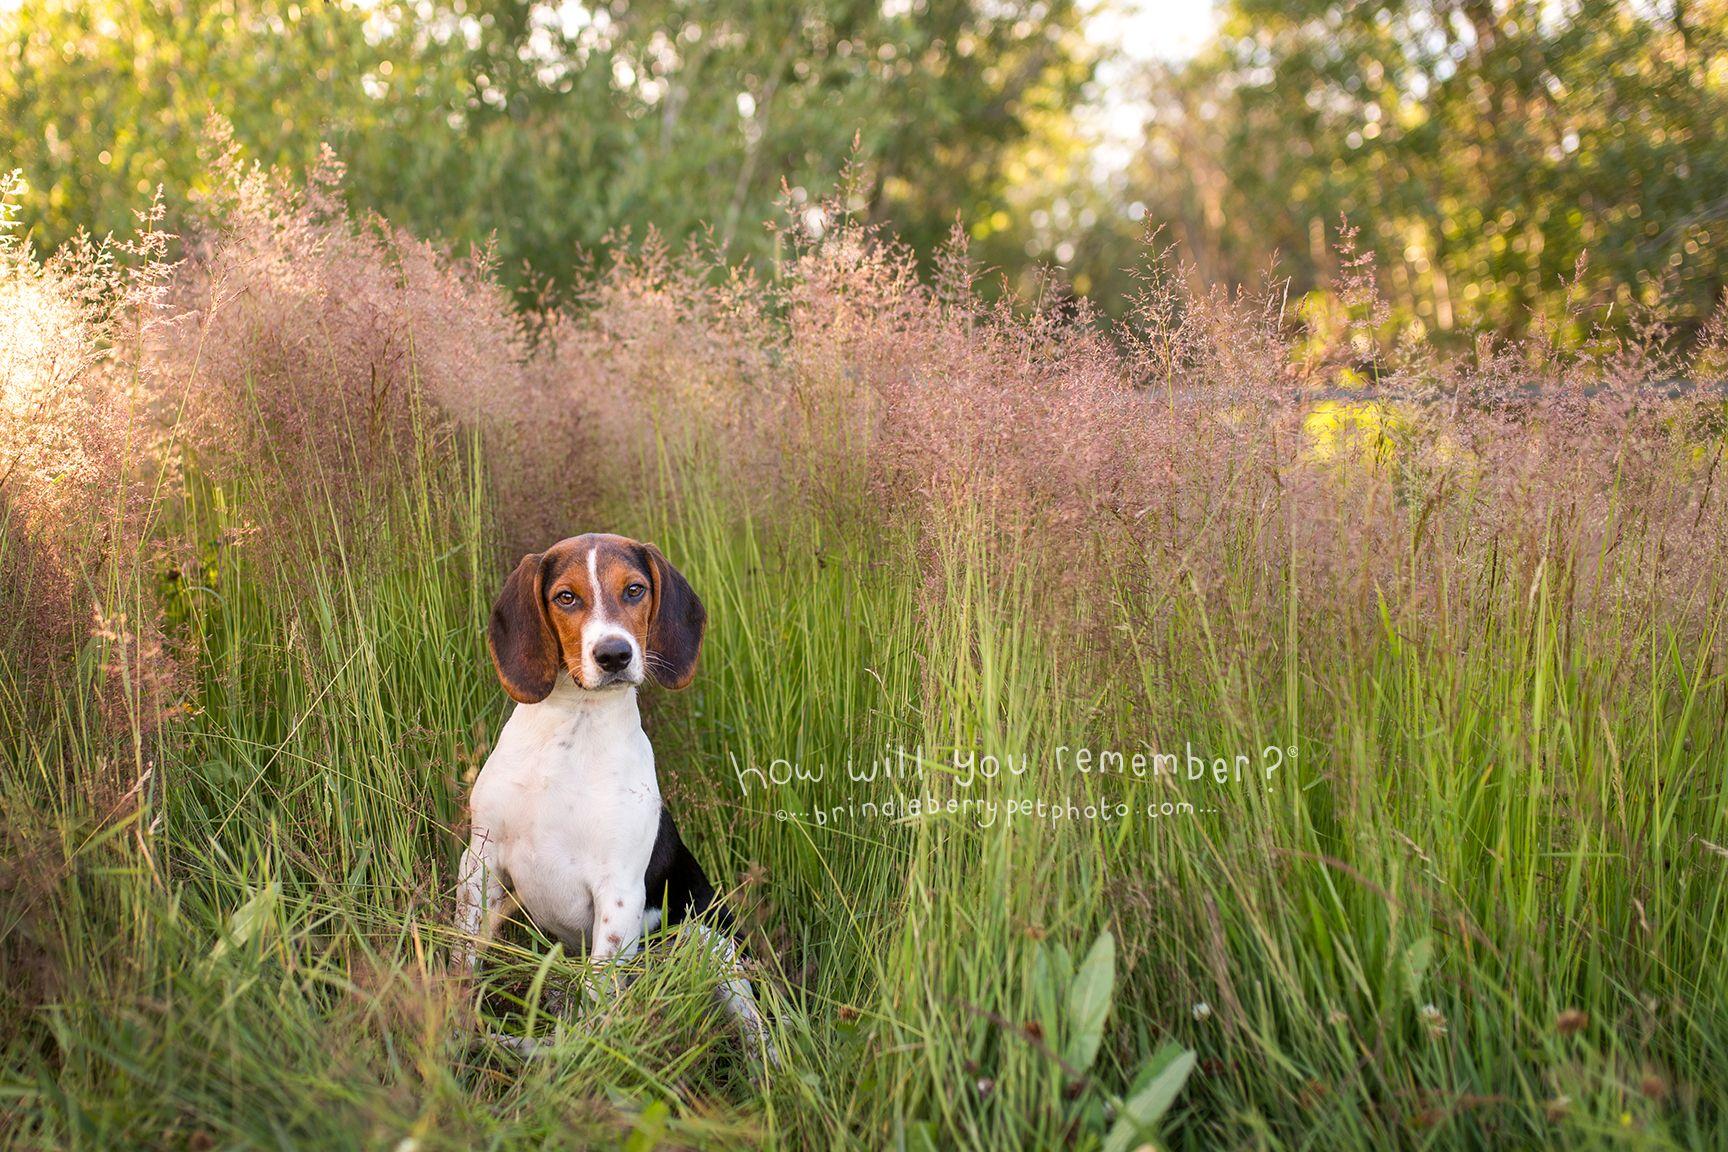 Enzo The Beagle Puppy Hiding In The Grass Beagle